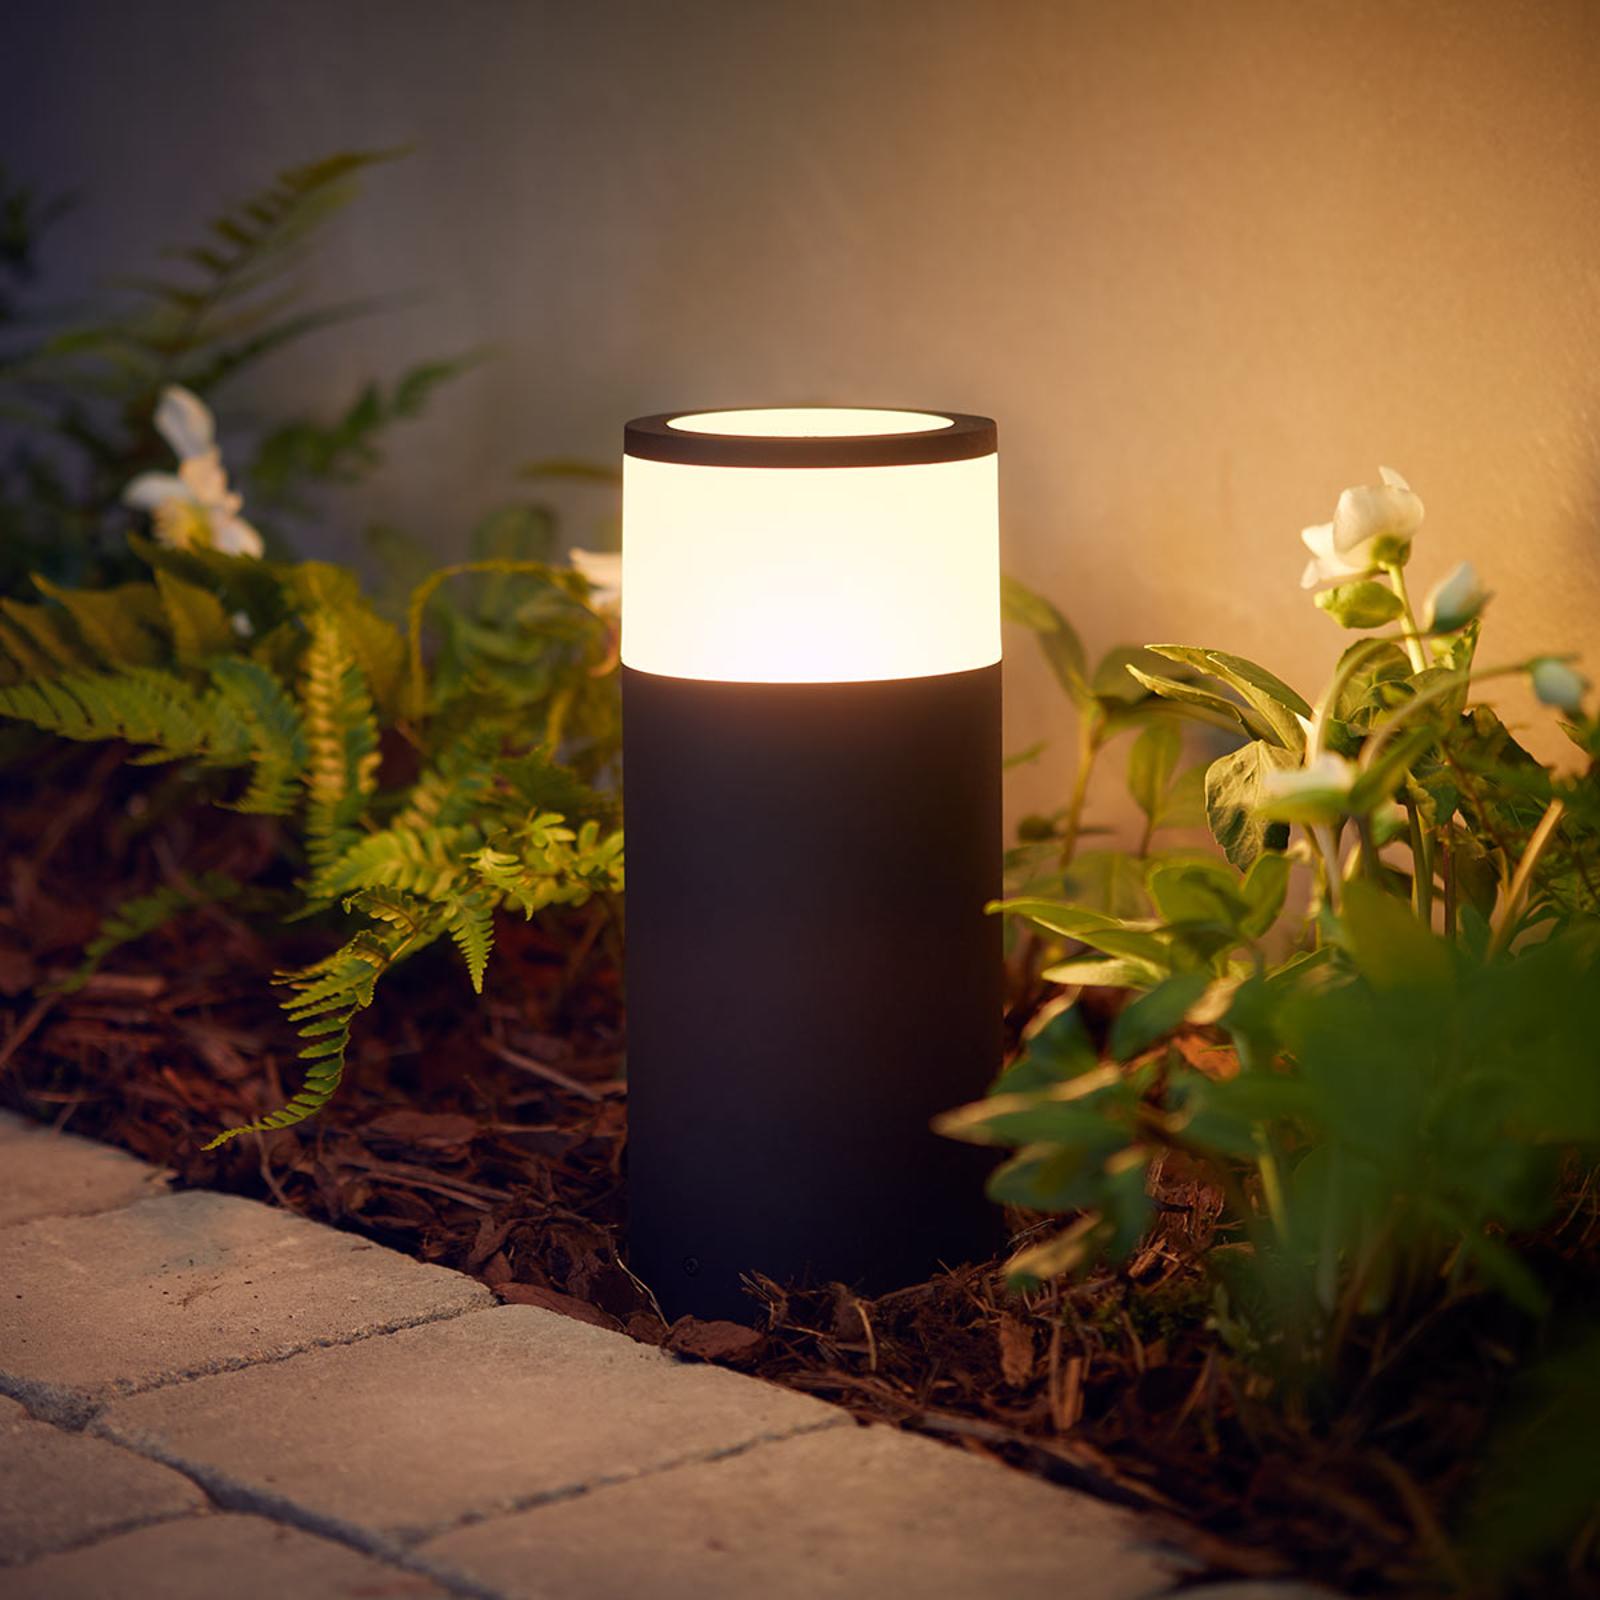 Philips Hue LED buitenwandlamp Calla, basisset